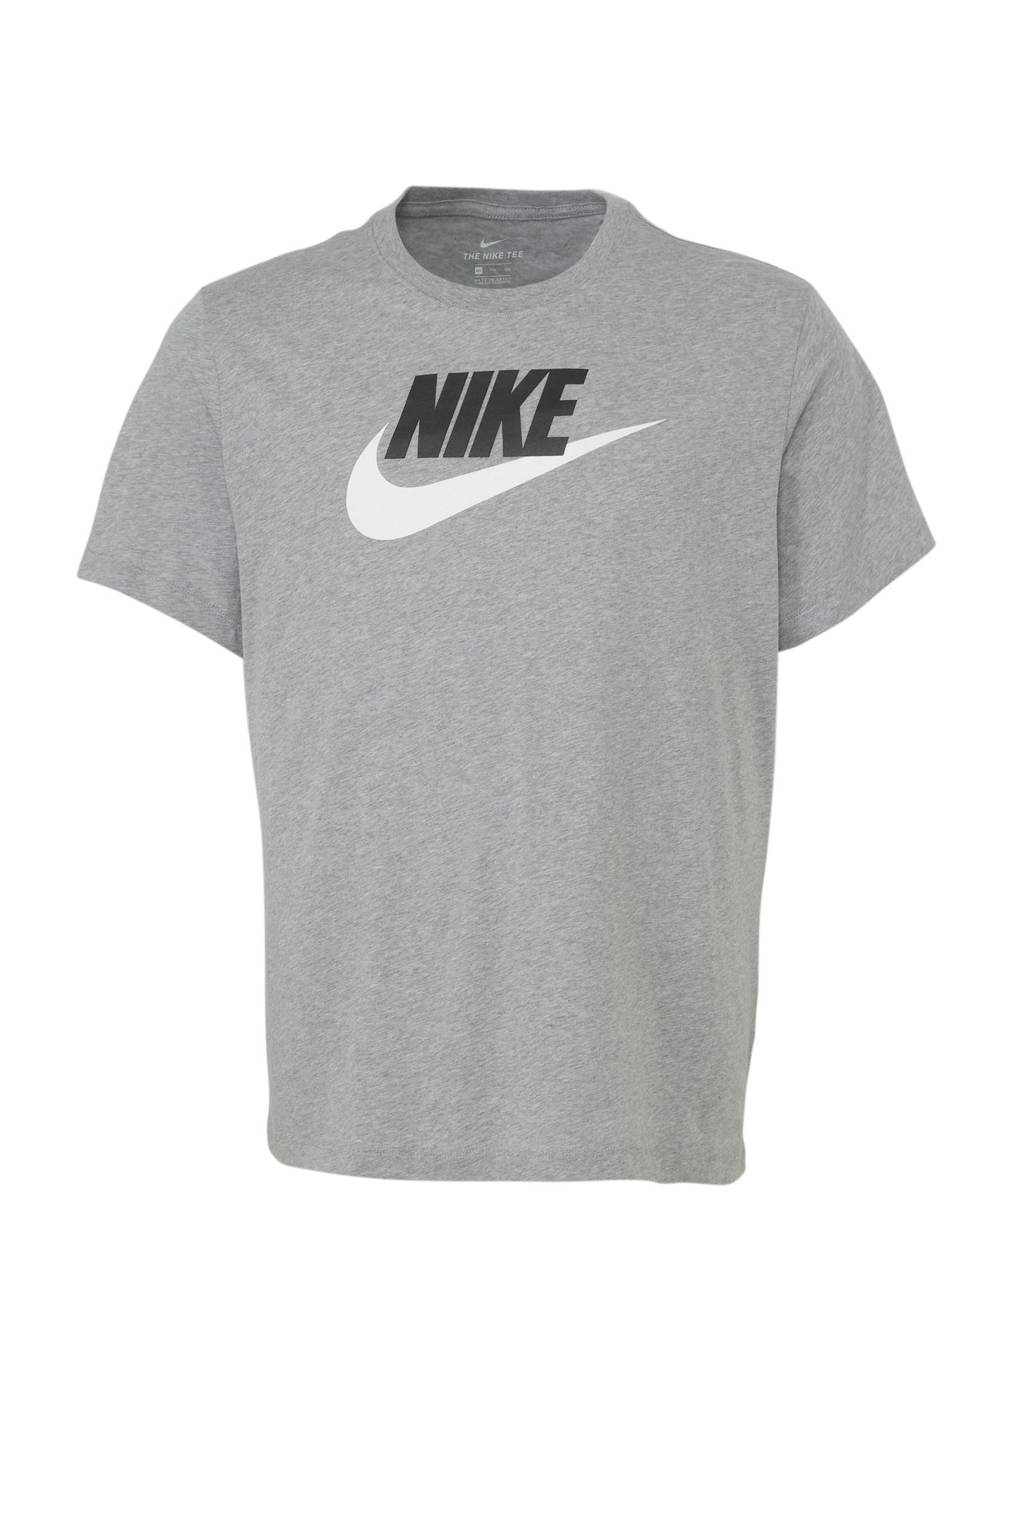 Nike T-shirt grijs melange, grijs melange/wit/zwart